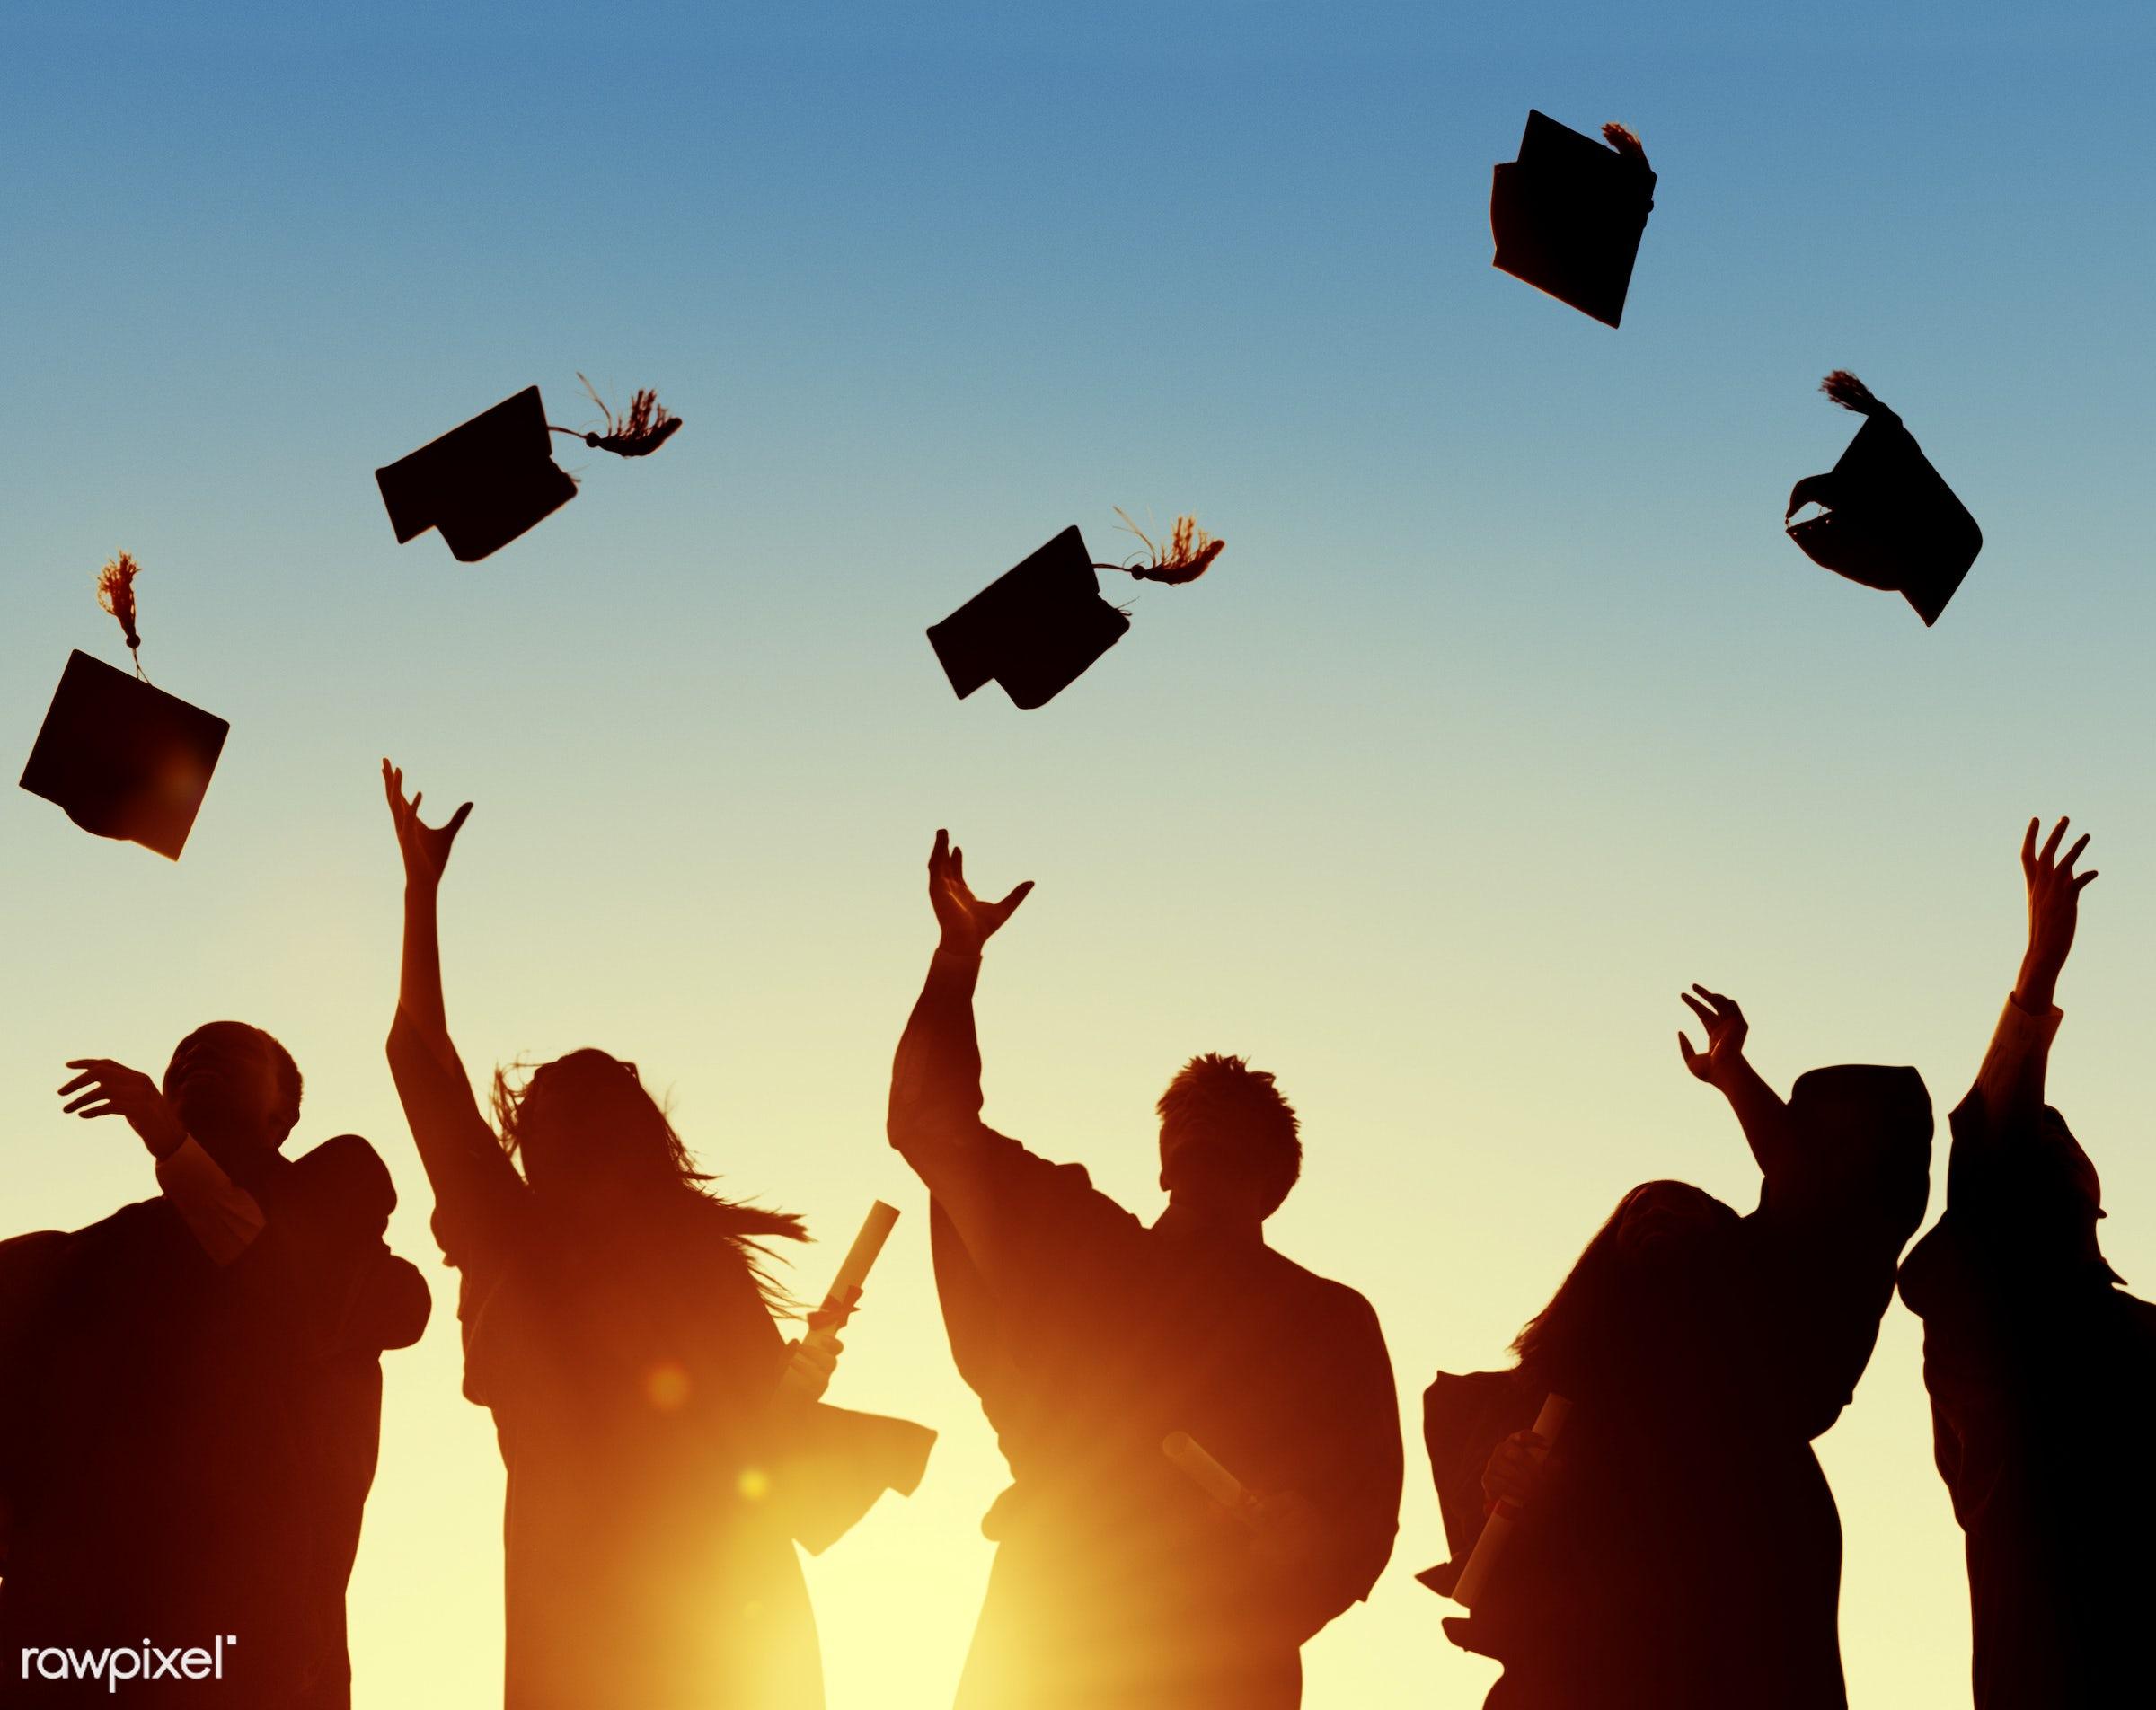 graduation, academic, achievement, campus, cap, celebration, ceremony, certificate, cheerful, college, college student,...